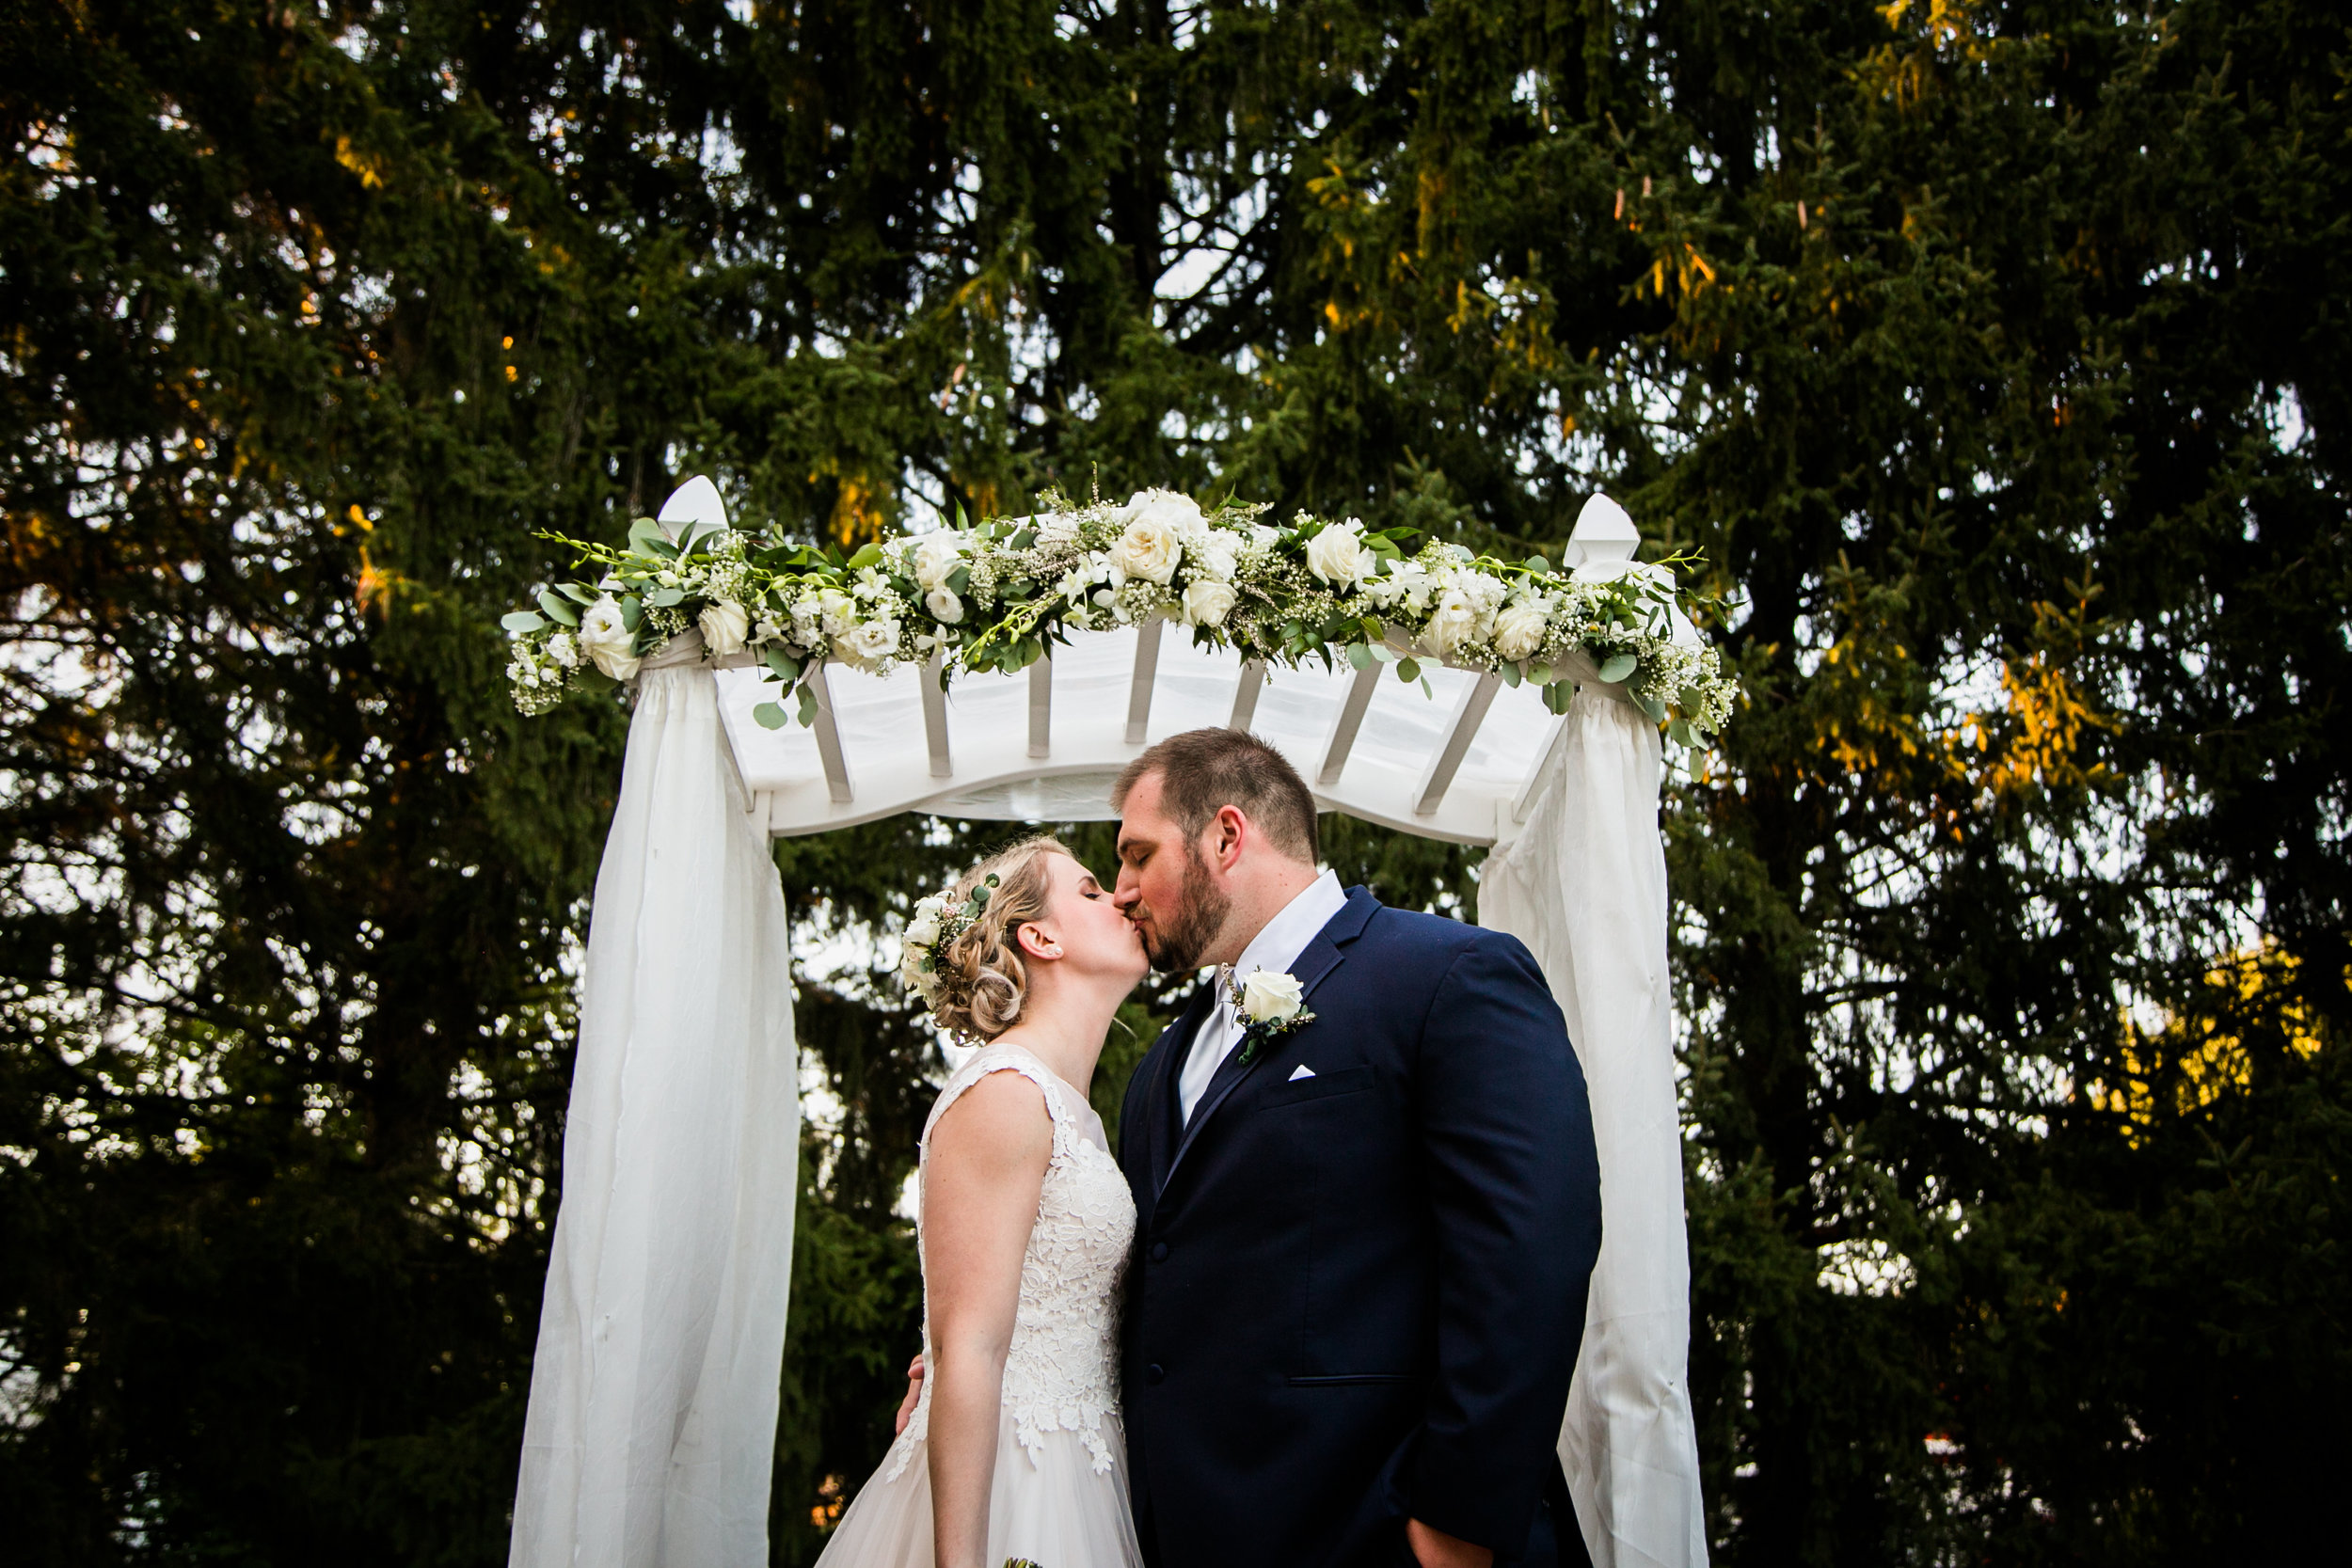 LA LUNA BANQUET HALL WEDDING BENSALEM - 064.jpg